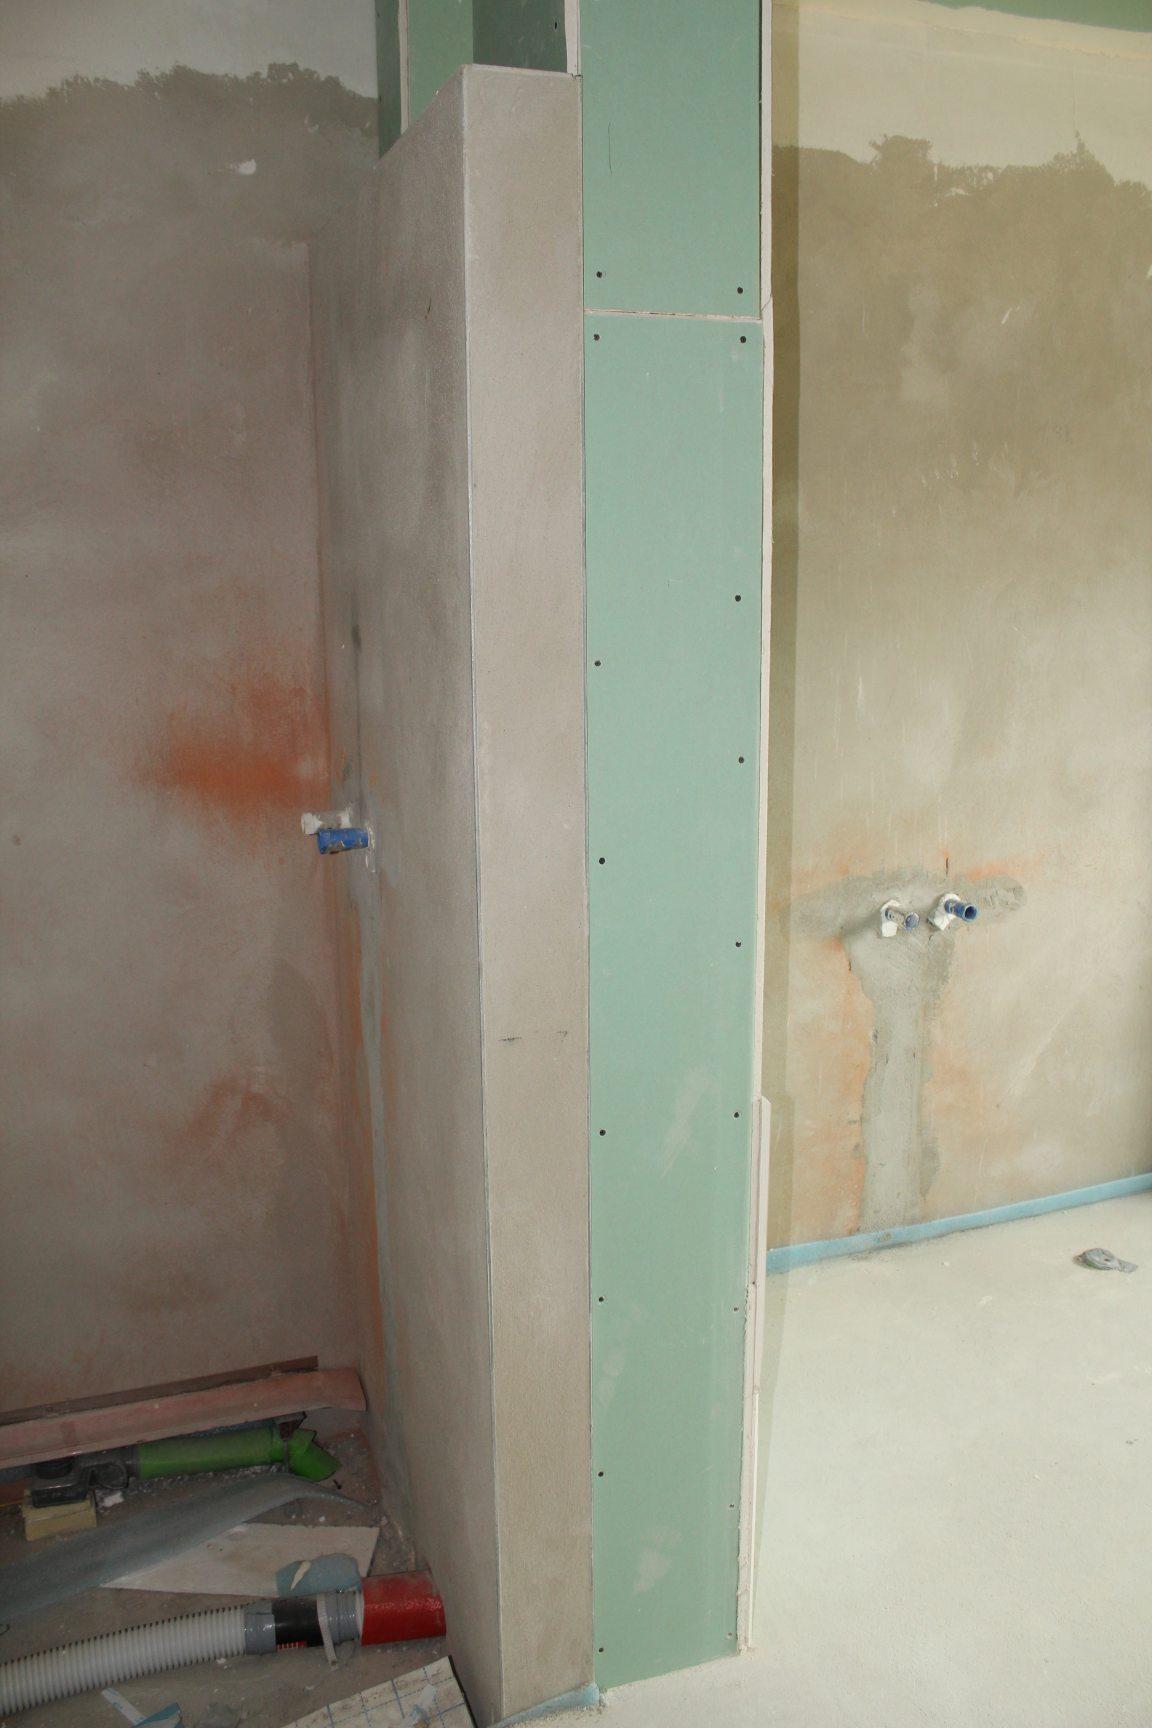 Badezimmer Trockenbau Ideen Planung Badezimmer Badplanung Und